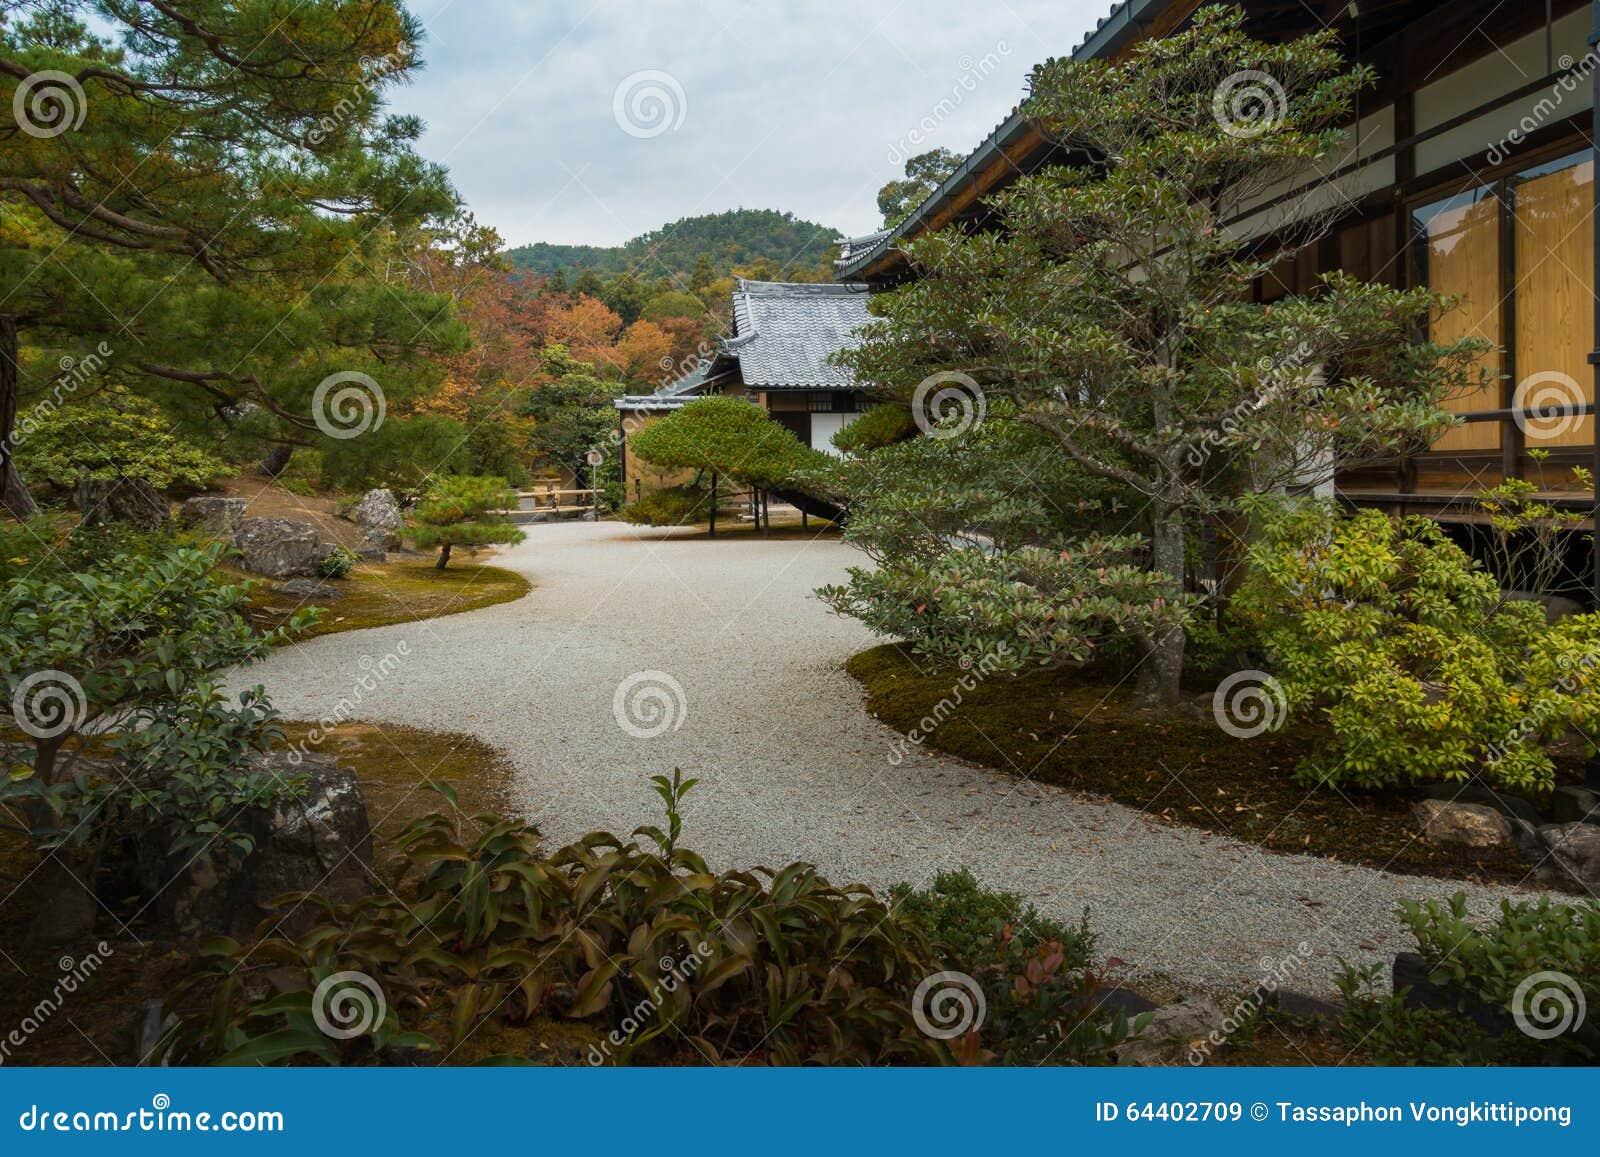 japanese style garden house backyard pathway stock image image